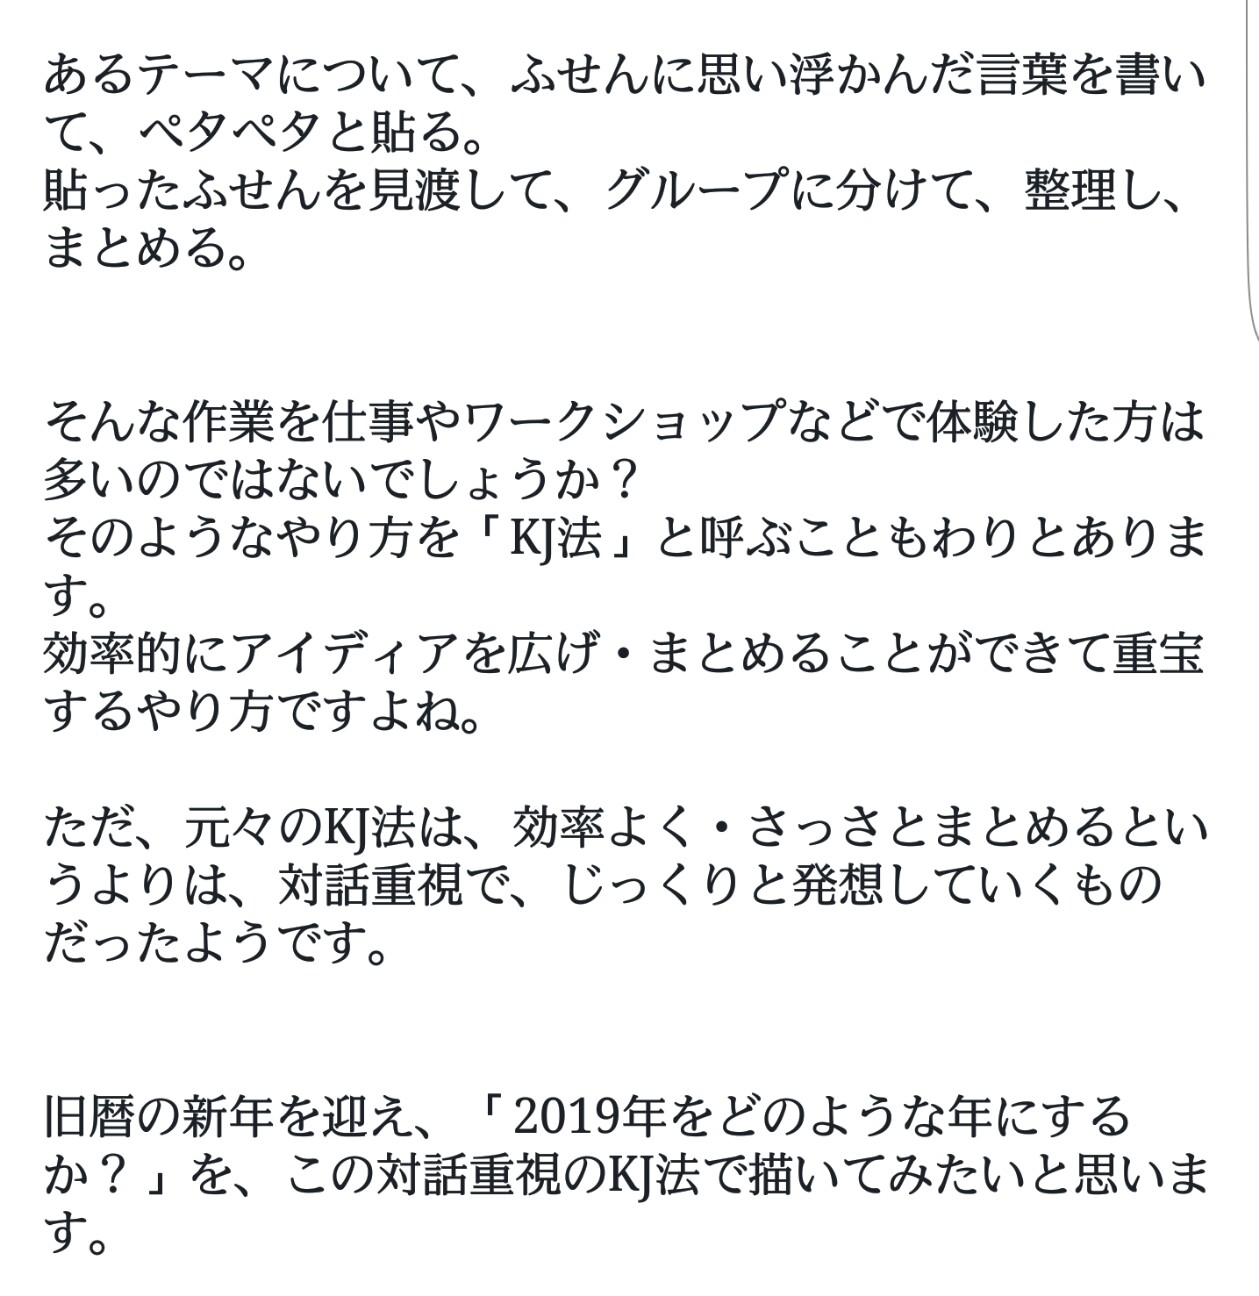 f:id:hitotobi:20190209152024j:image